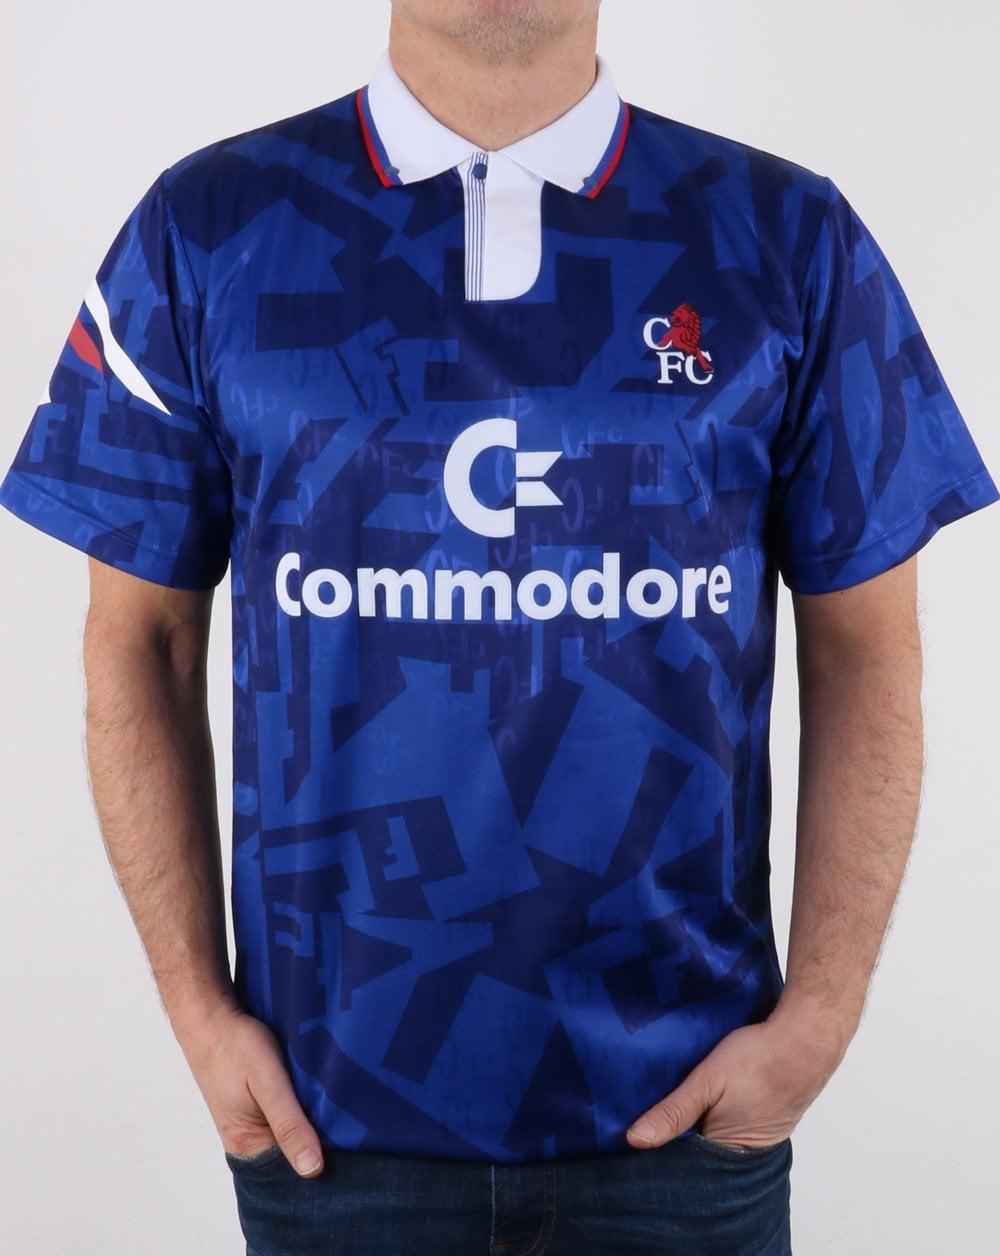 80s Casual Classics 80s Casual Classics Chelsea 1992 Football Shirt Blue 5da120b89